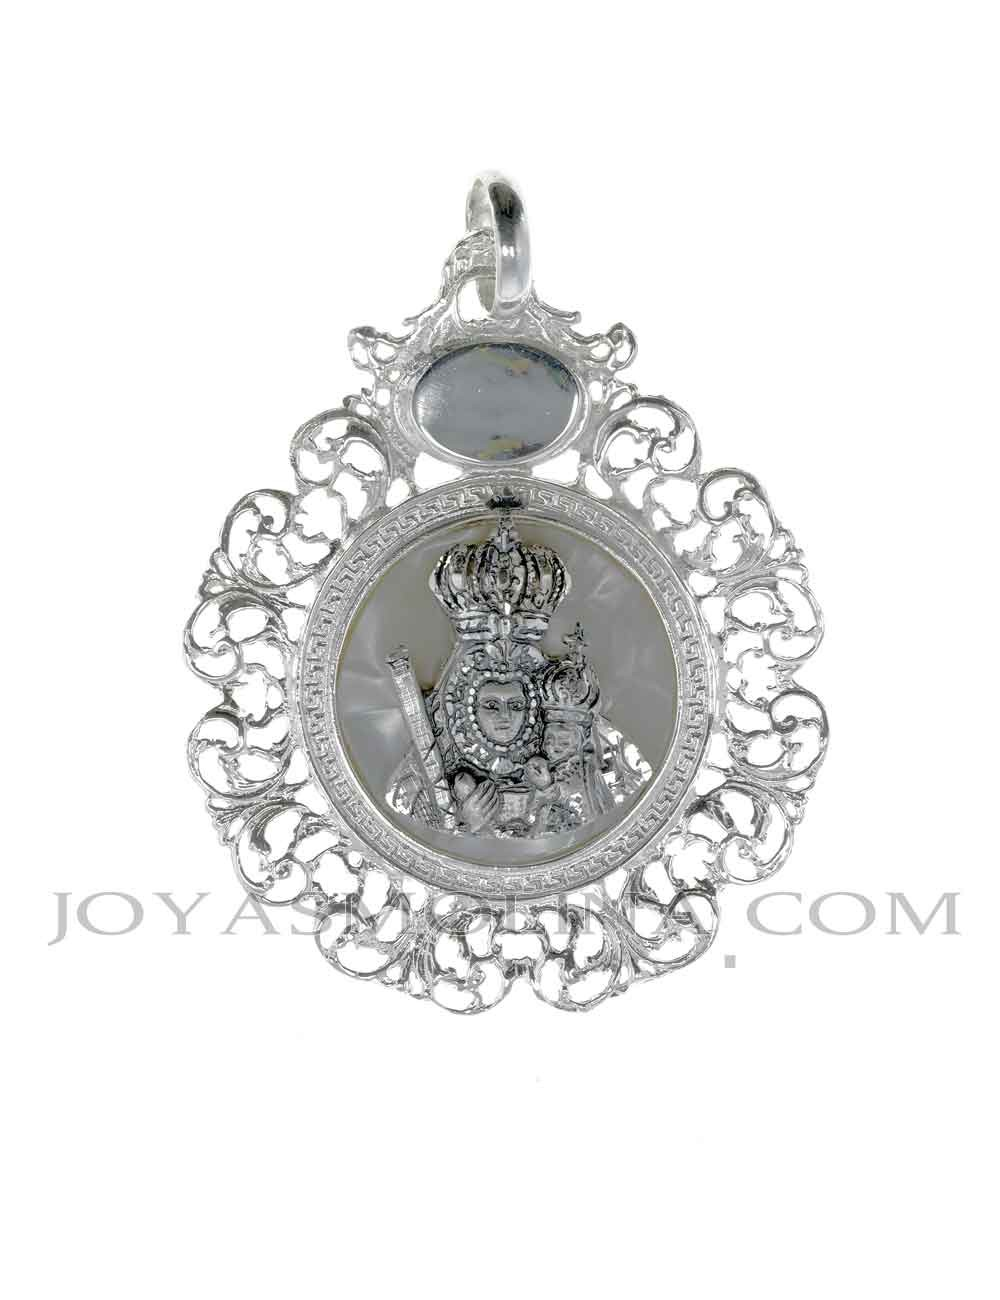 Medalla de cuna Virgen de la Cabeza sobre nácar mediana